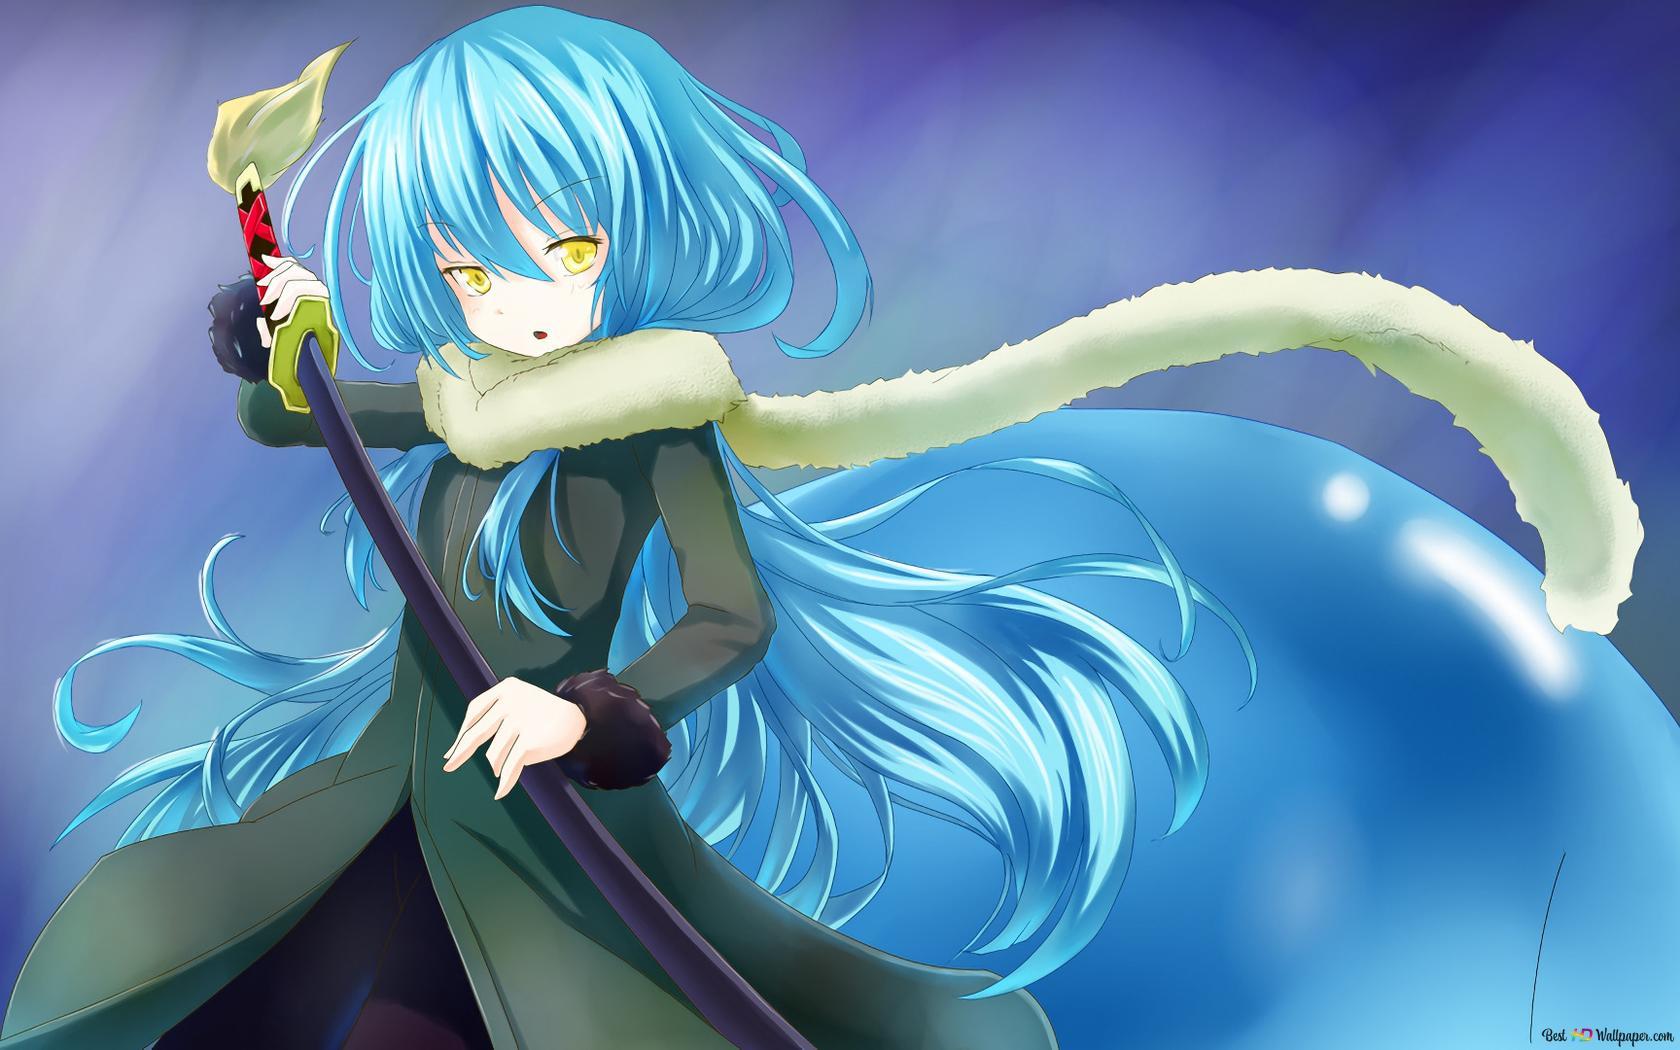 That Time I Got Reincarnated As A Slime Rimuru Tempest Slime Hd